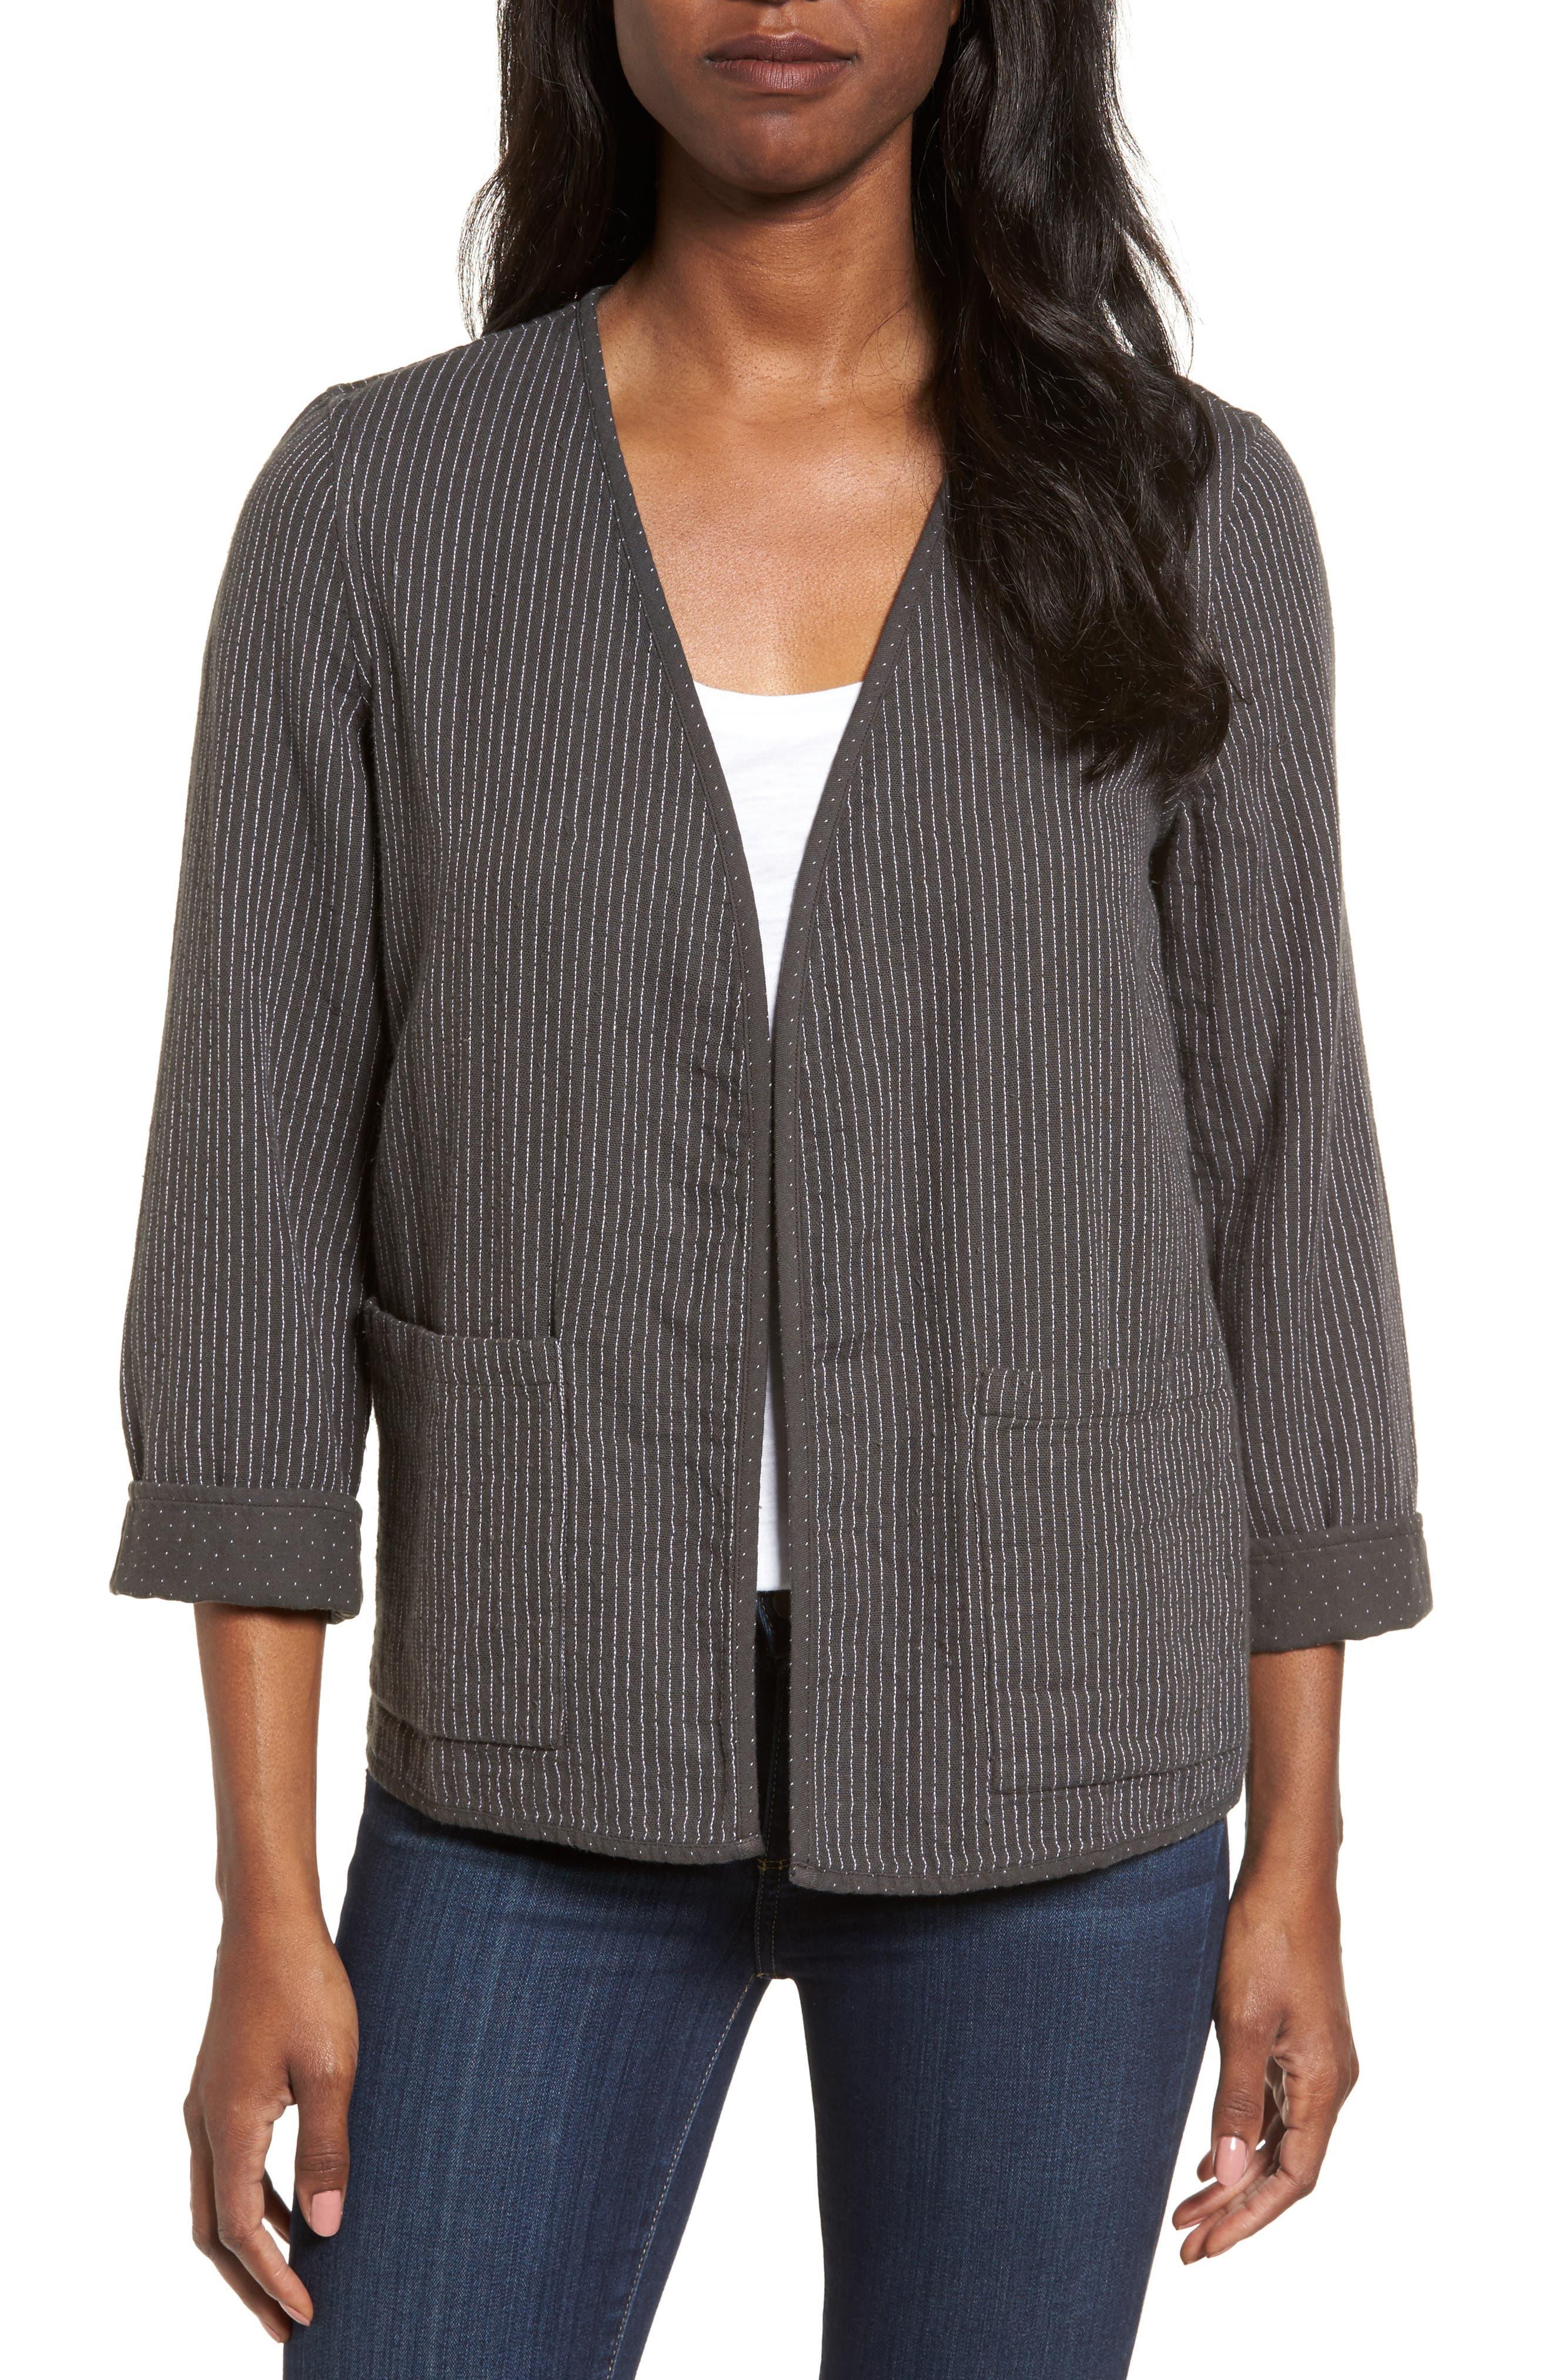 Reversible Organic Cotton Jacket,                             Main thumbnail 1, color,                             210